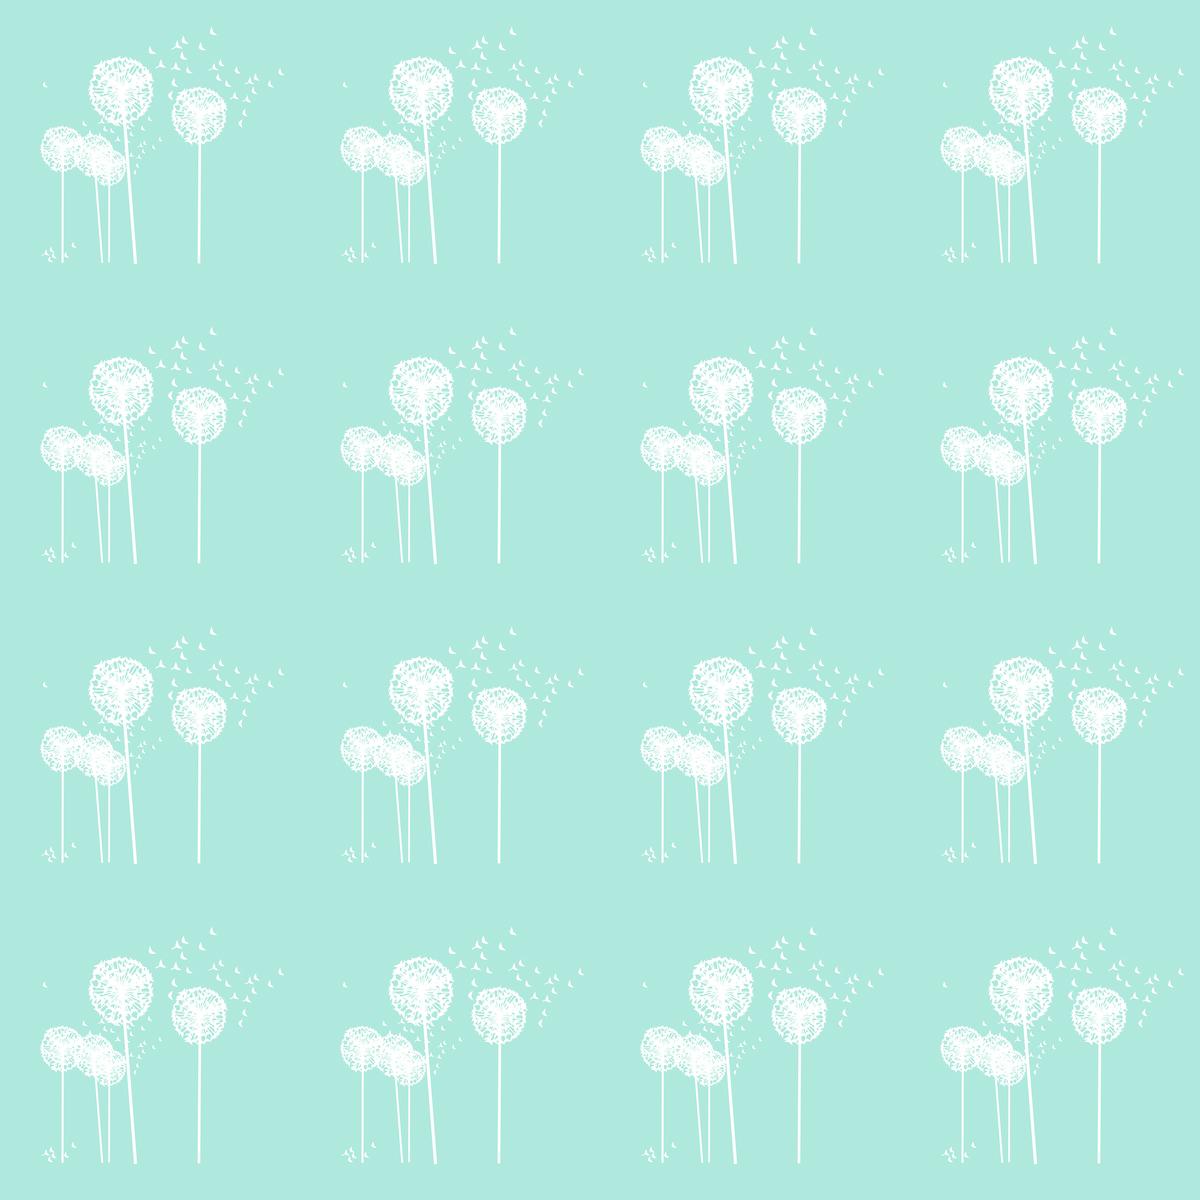 mint paper 민트라디오 12월 11일 방송(10주년 기념 100곡-청춘.